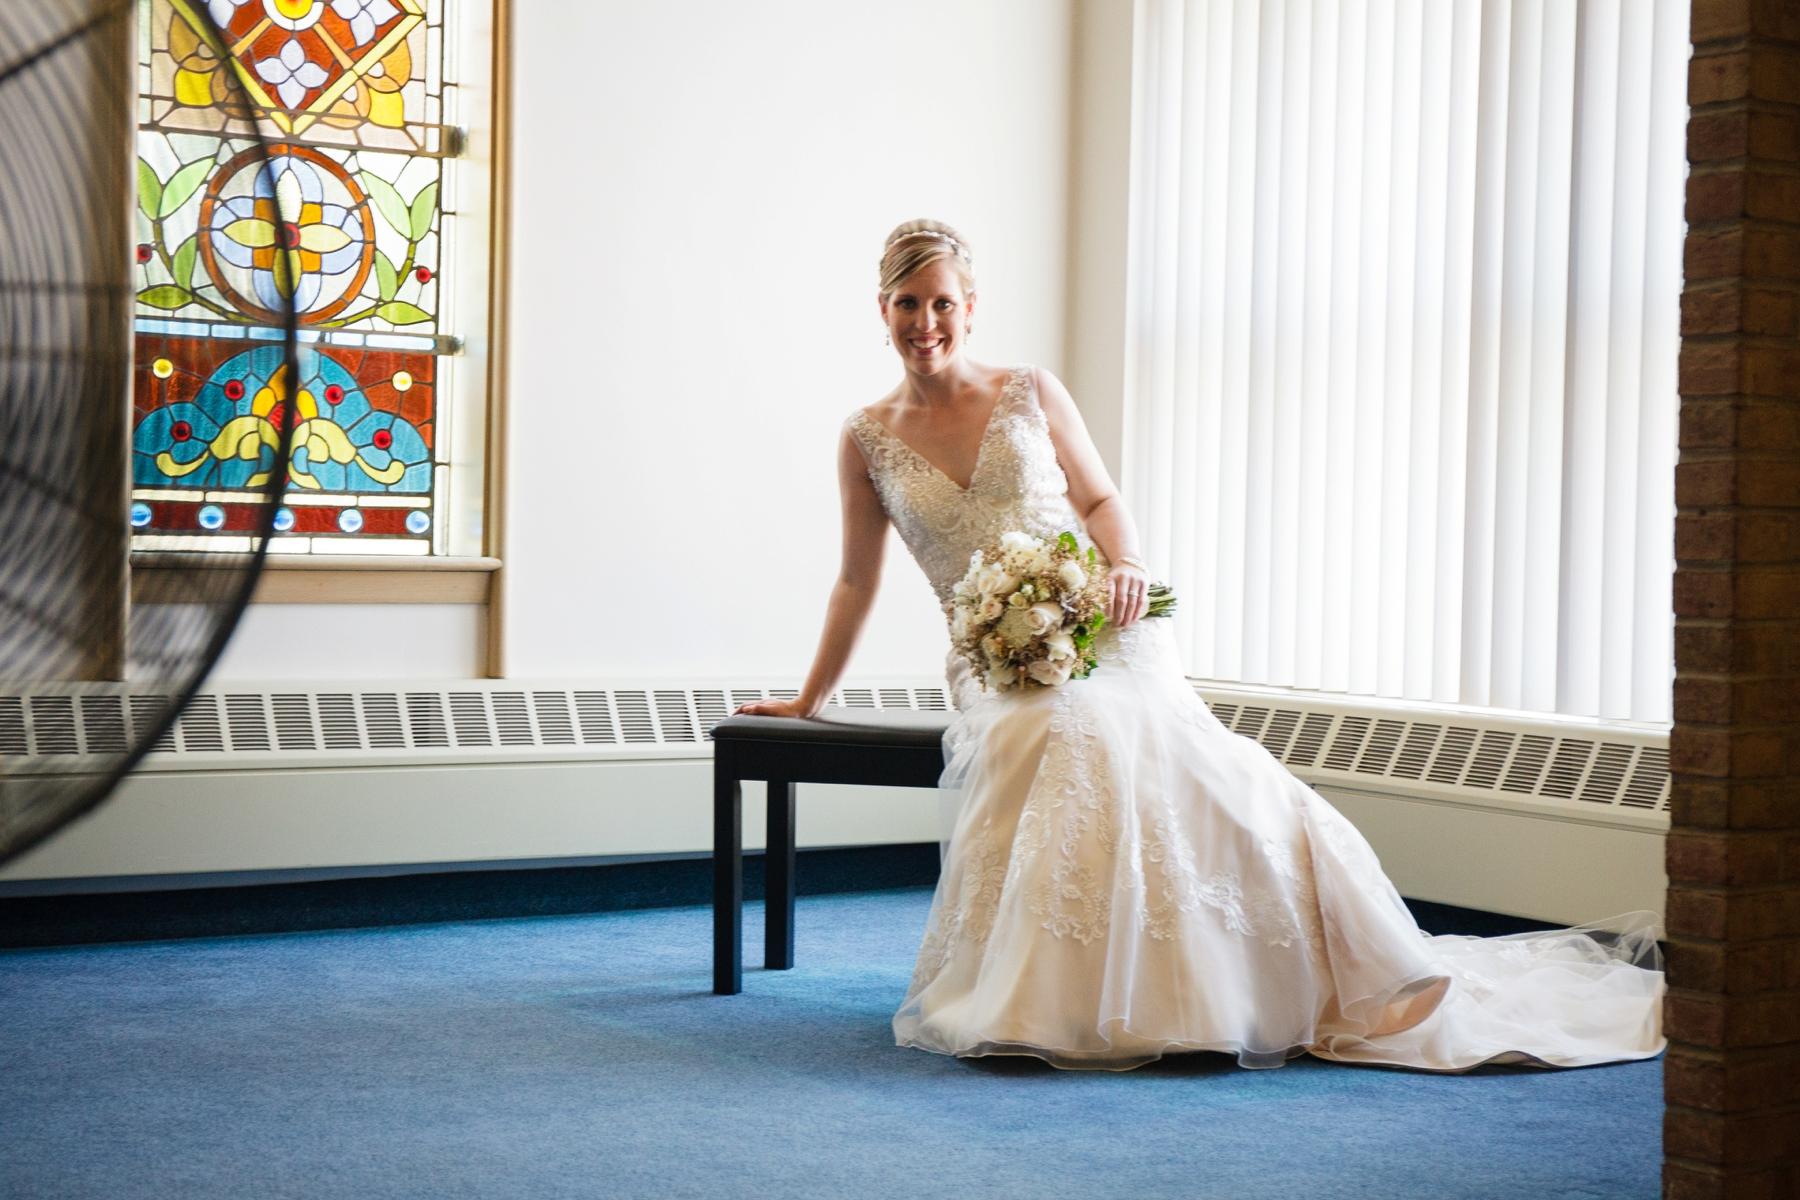 Ben_Jillian_Midland_Baycity_Wedding_0027.jpg